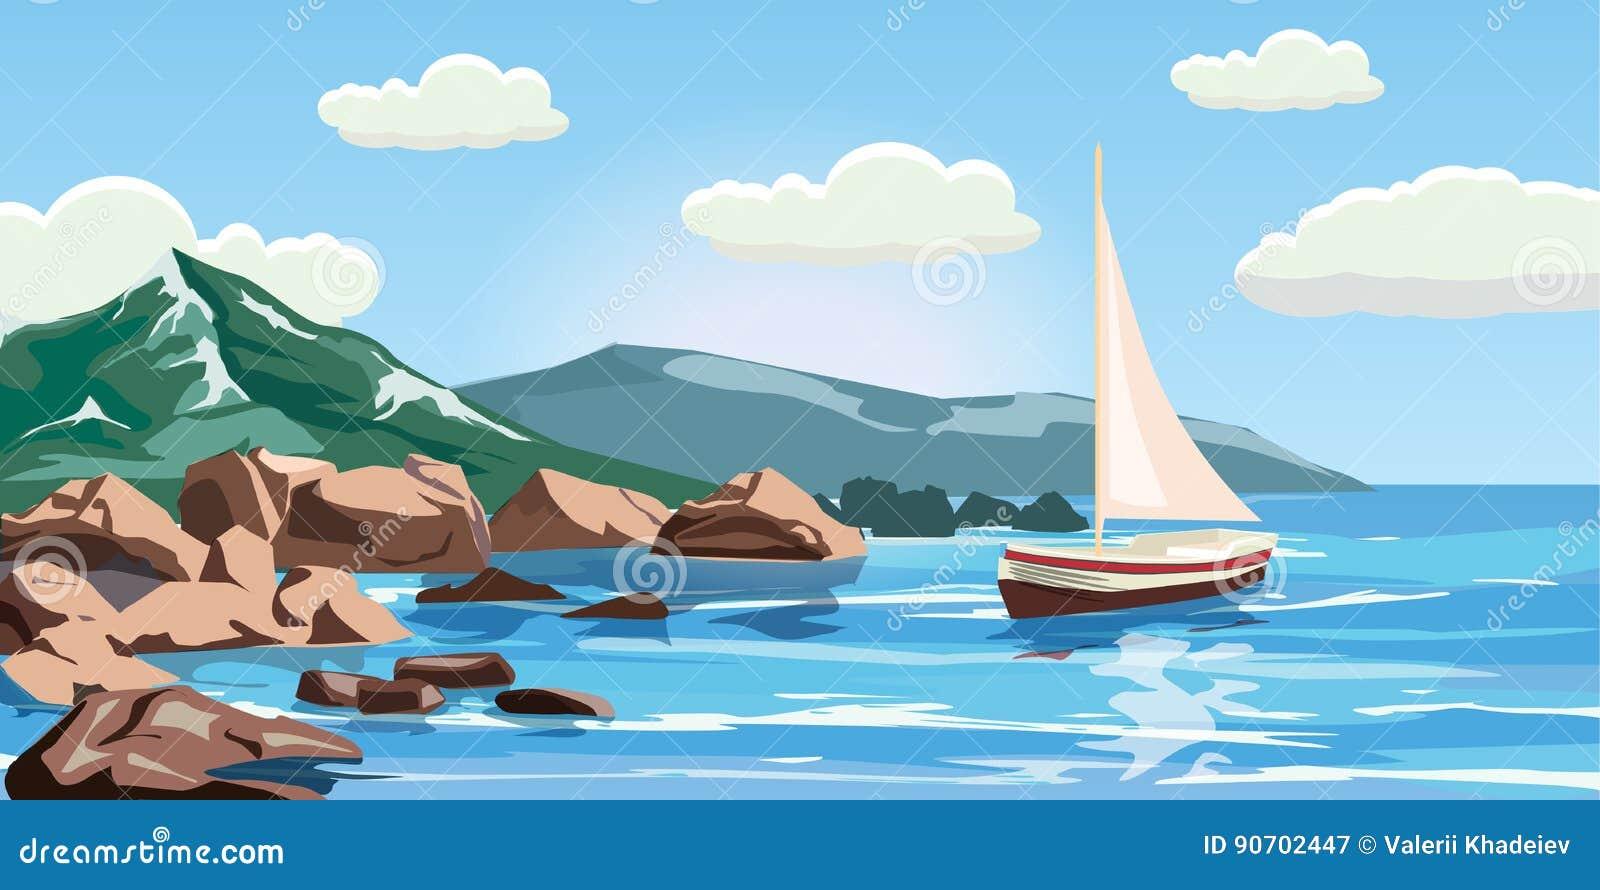 Seascape, βράχοι, απότομοι βράχοι, ένα γιοτ κάτω από το πανί, ωκεανός